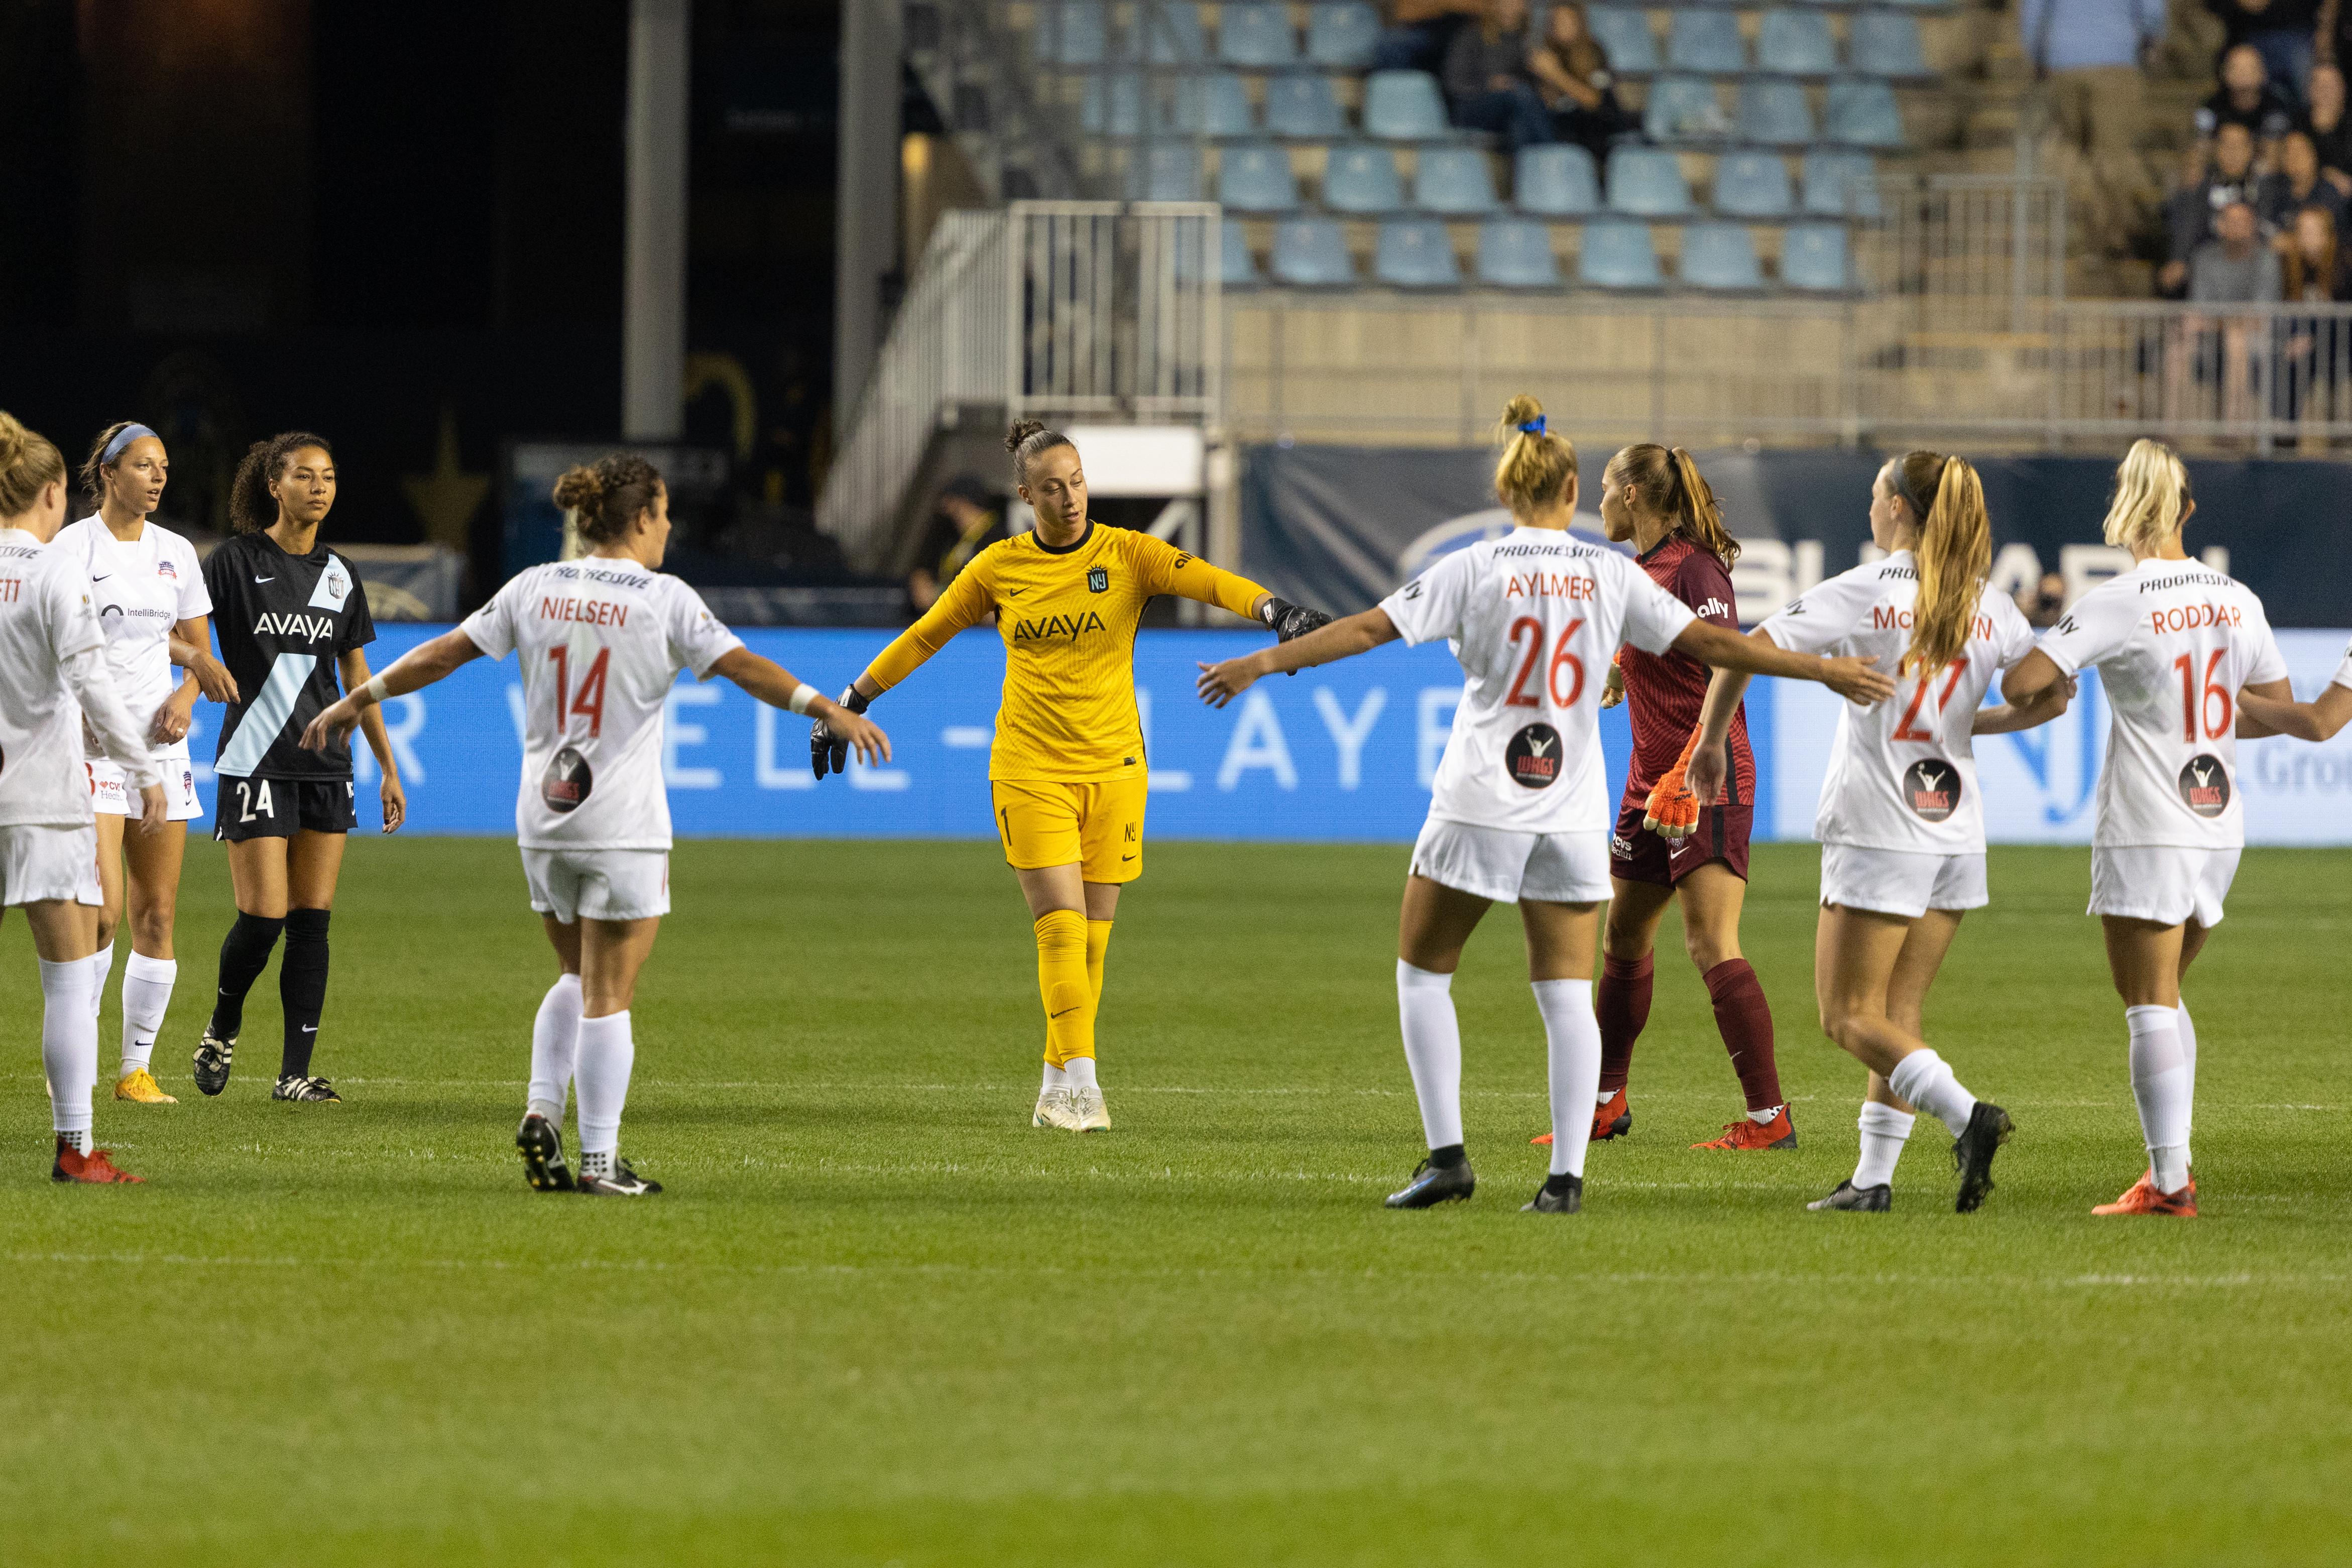 NWSL: National Women's Soccer League-Washington Spirit at NJ/NY Gotham FC